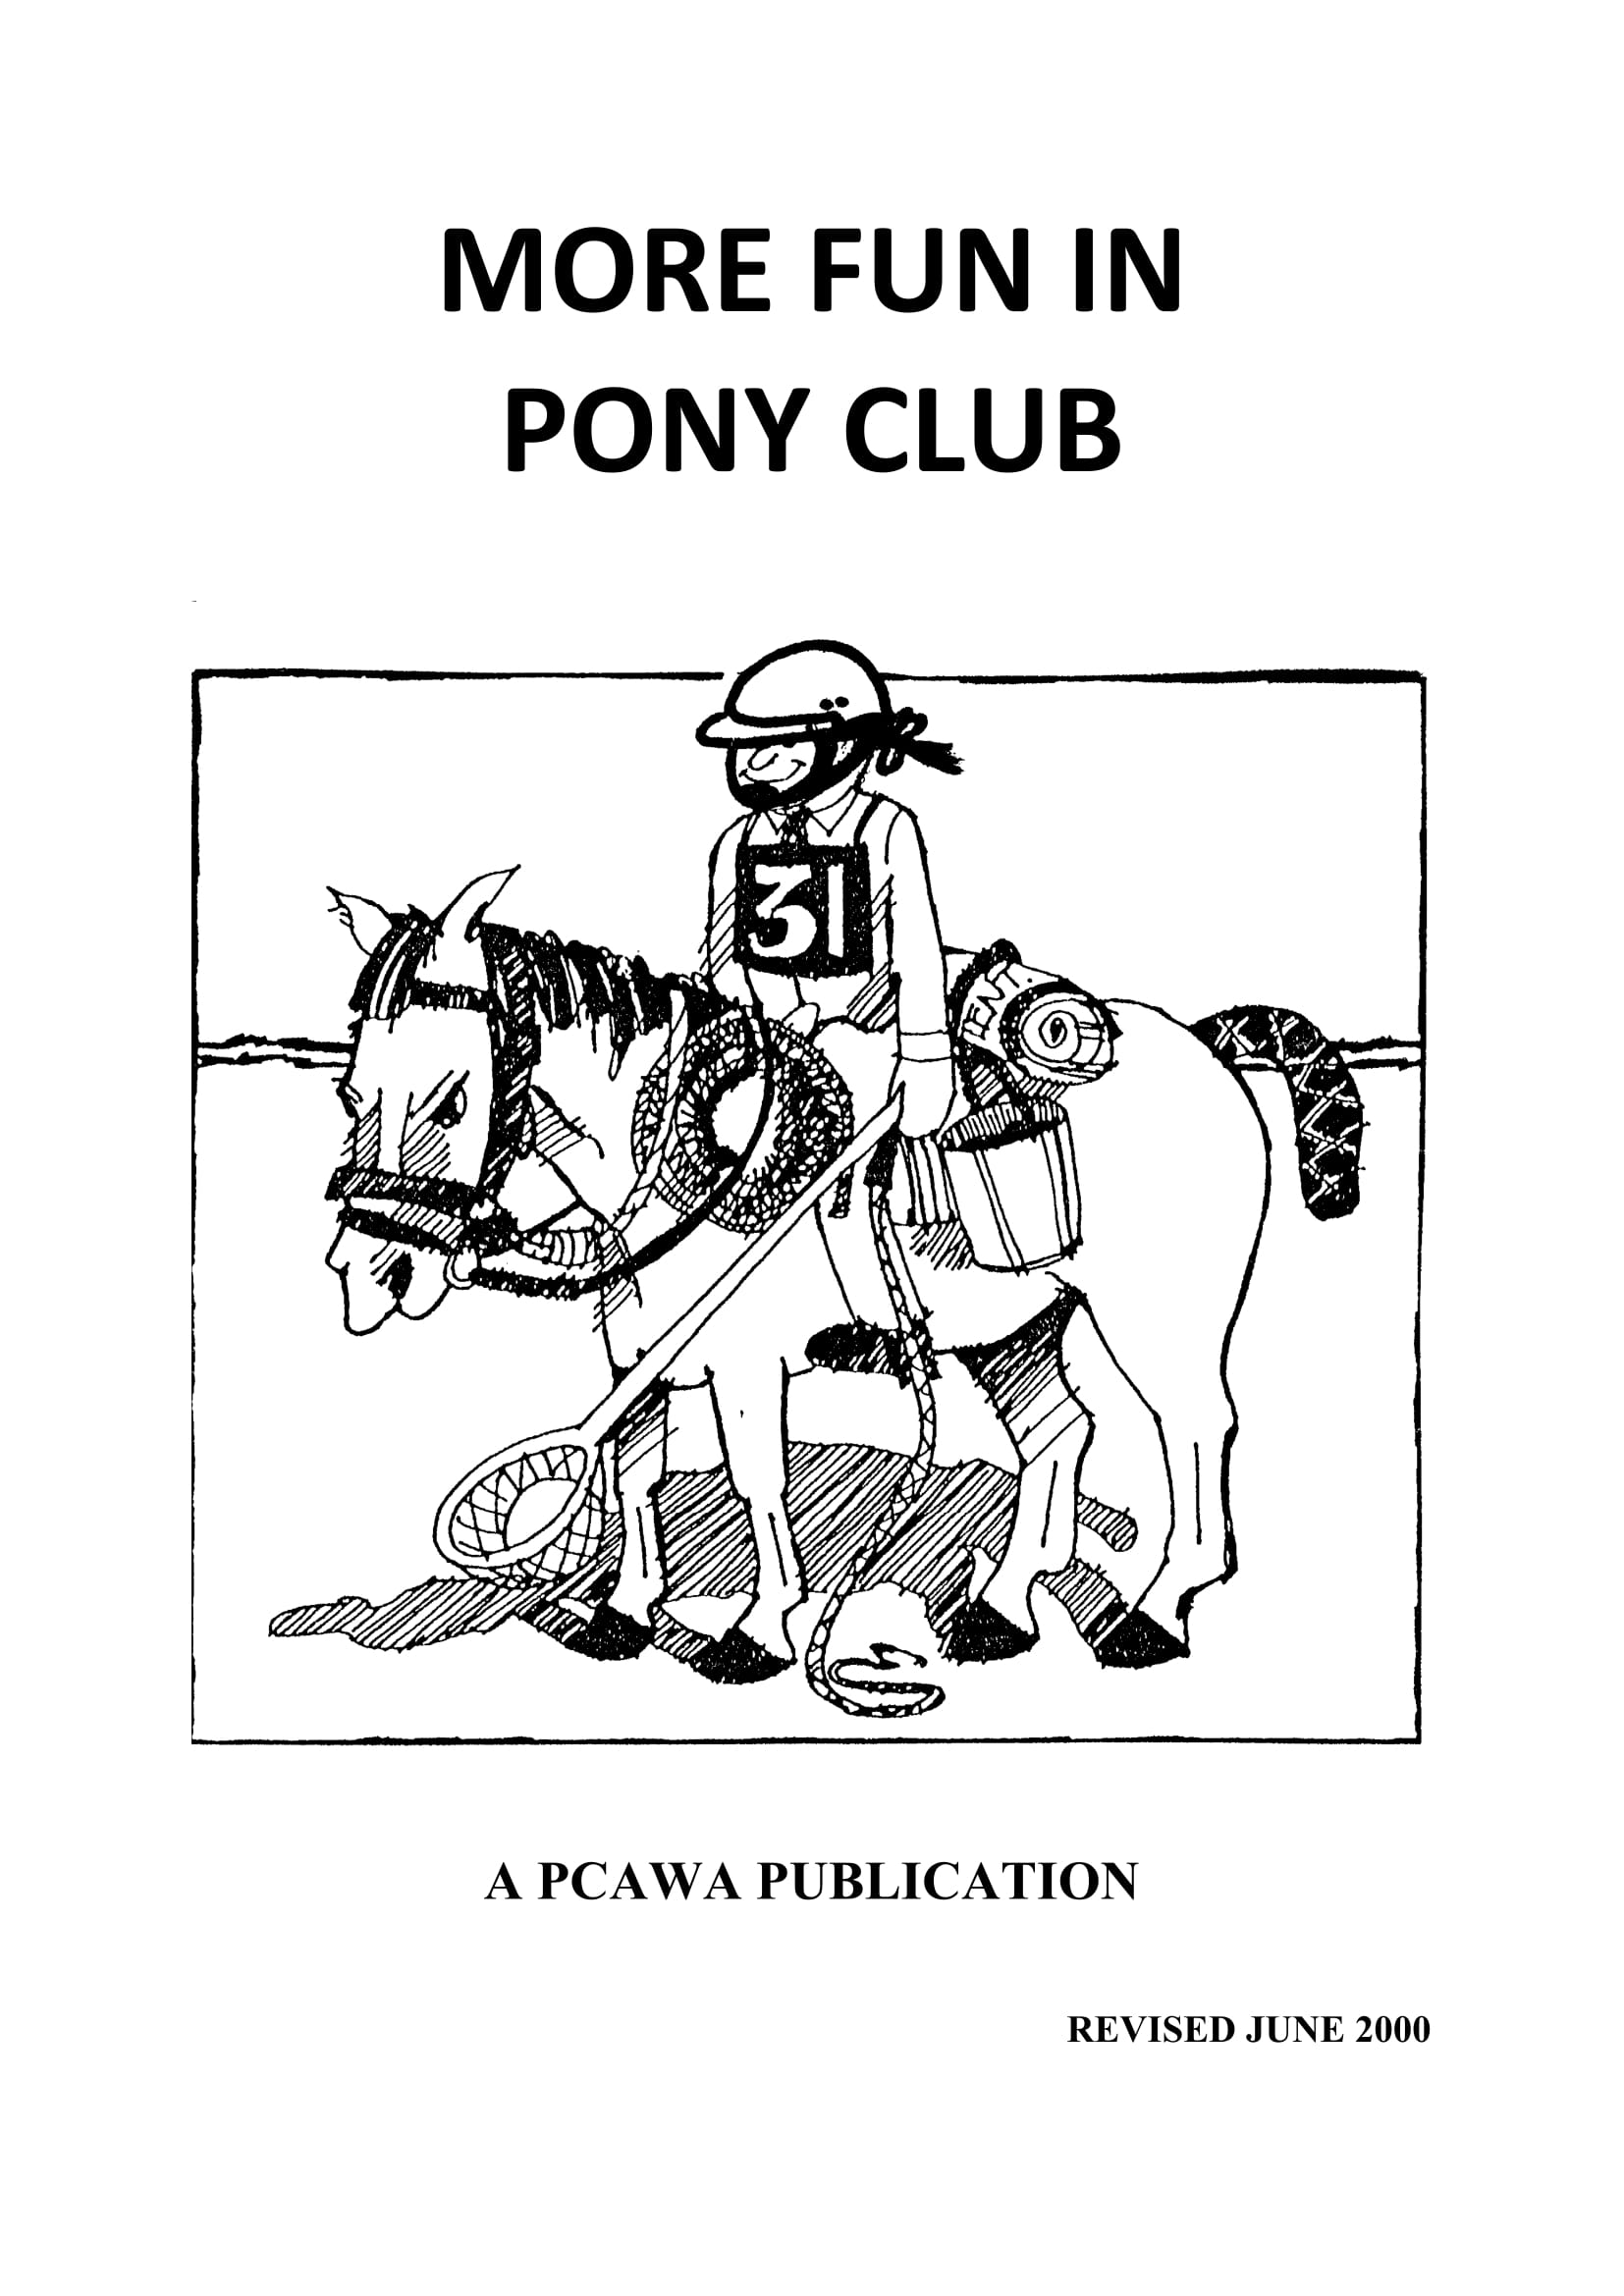 More Fun In Pony Club